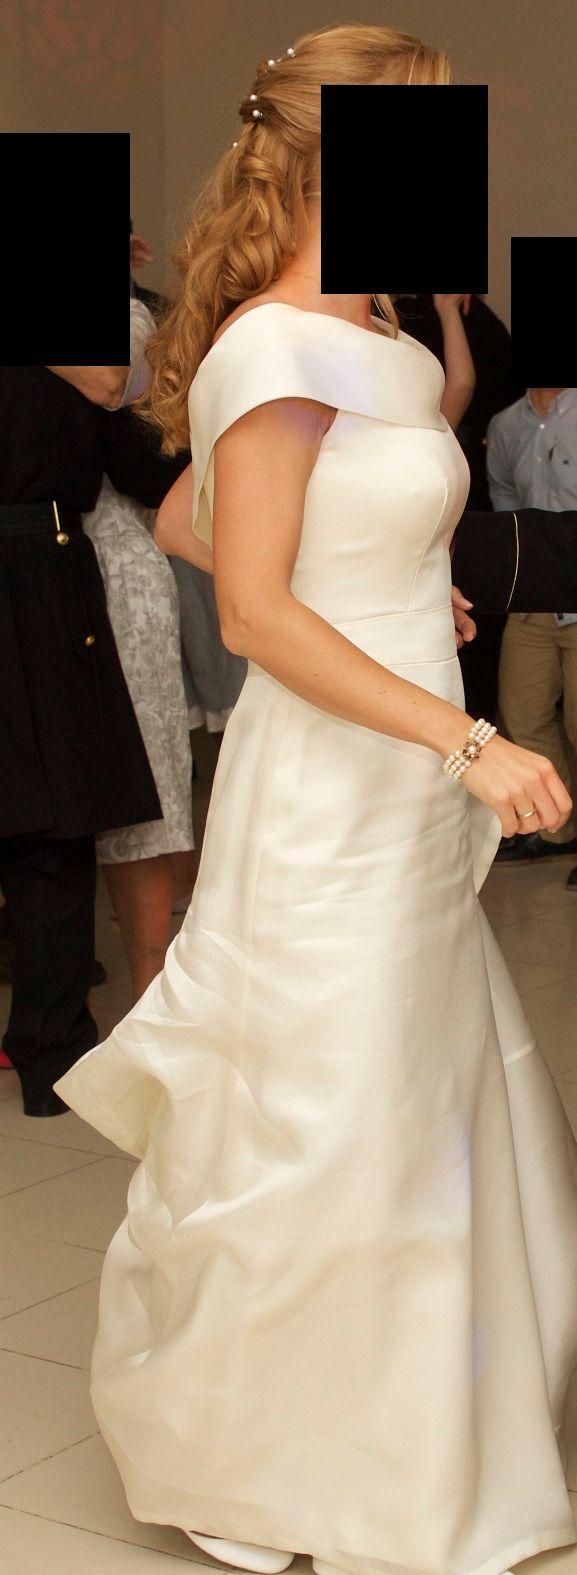 Espectacular vestido de novia marca Rosa Clará